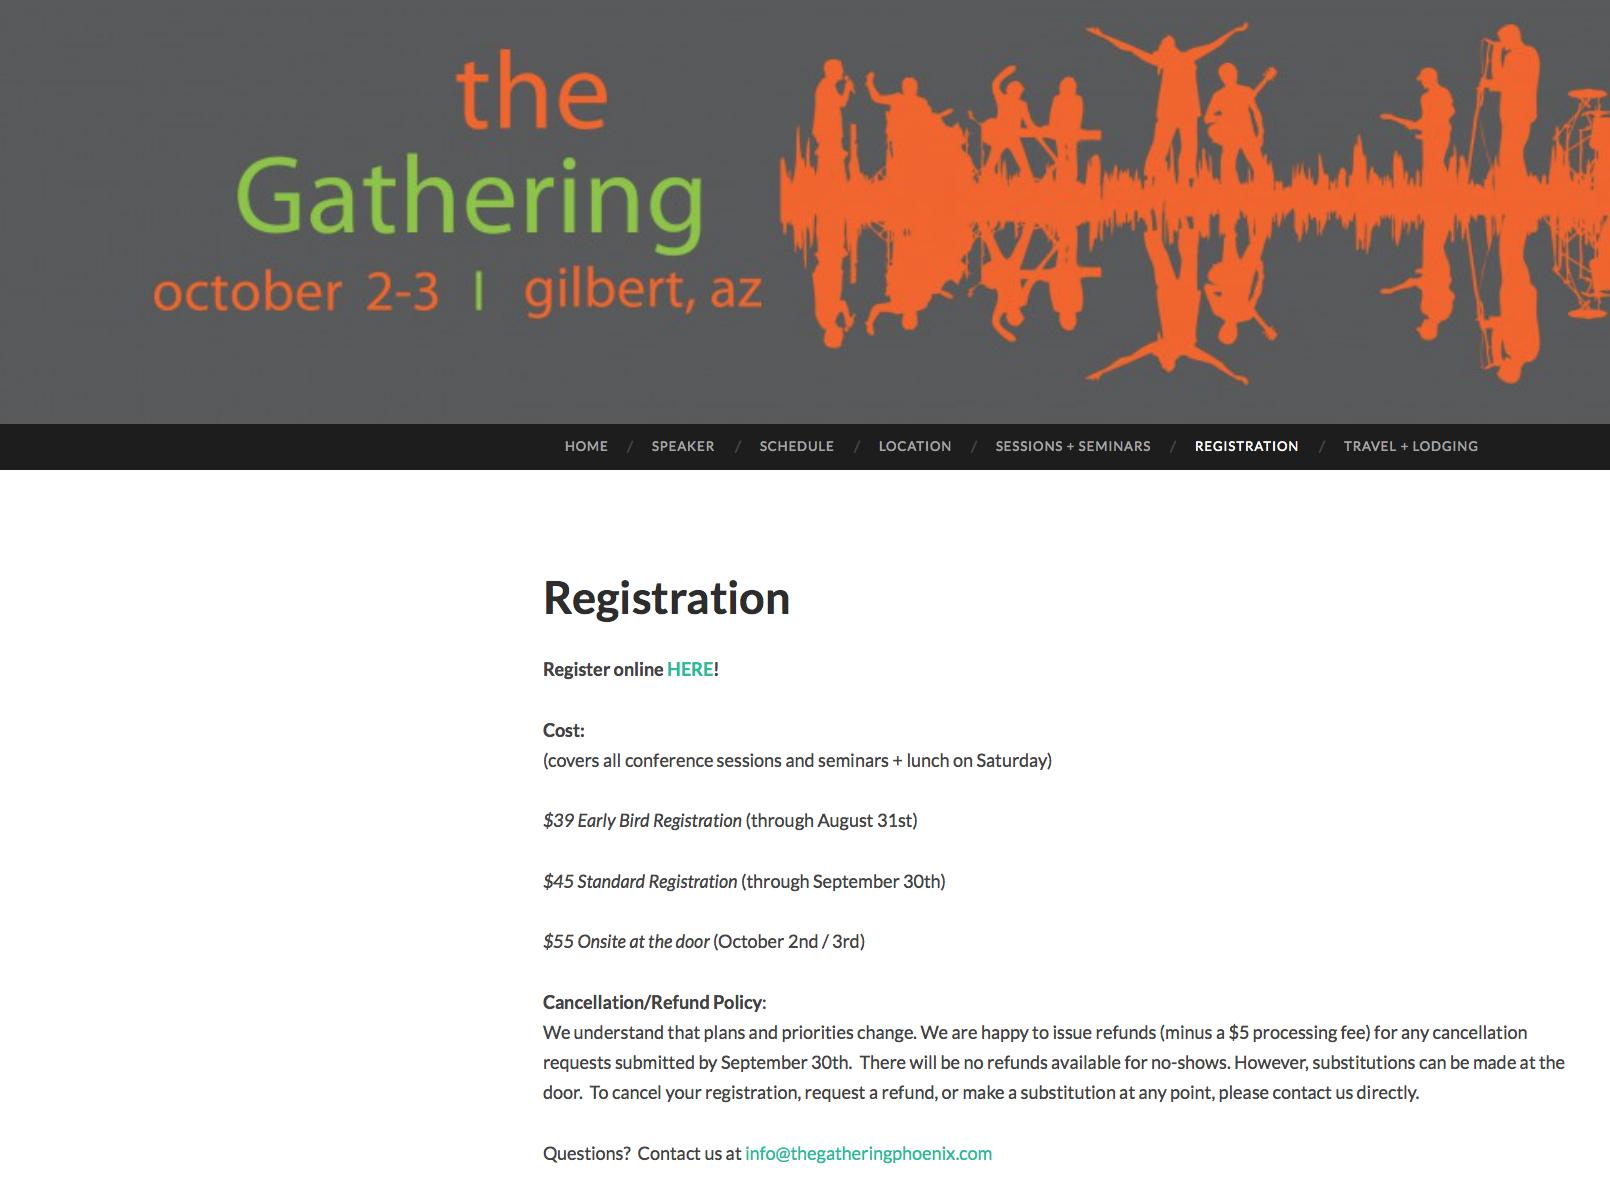 2015-09-18 Kauflin coference in SG Gilbert